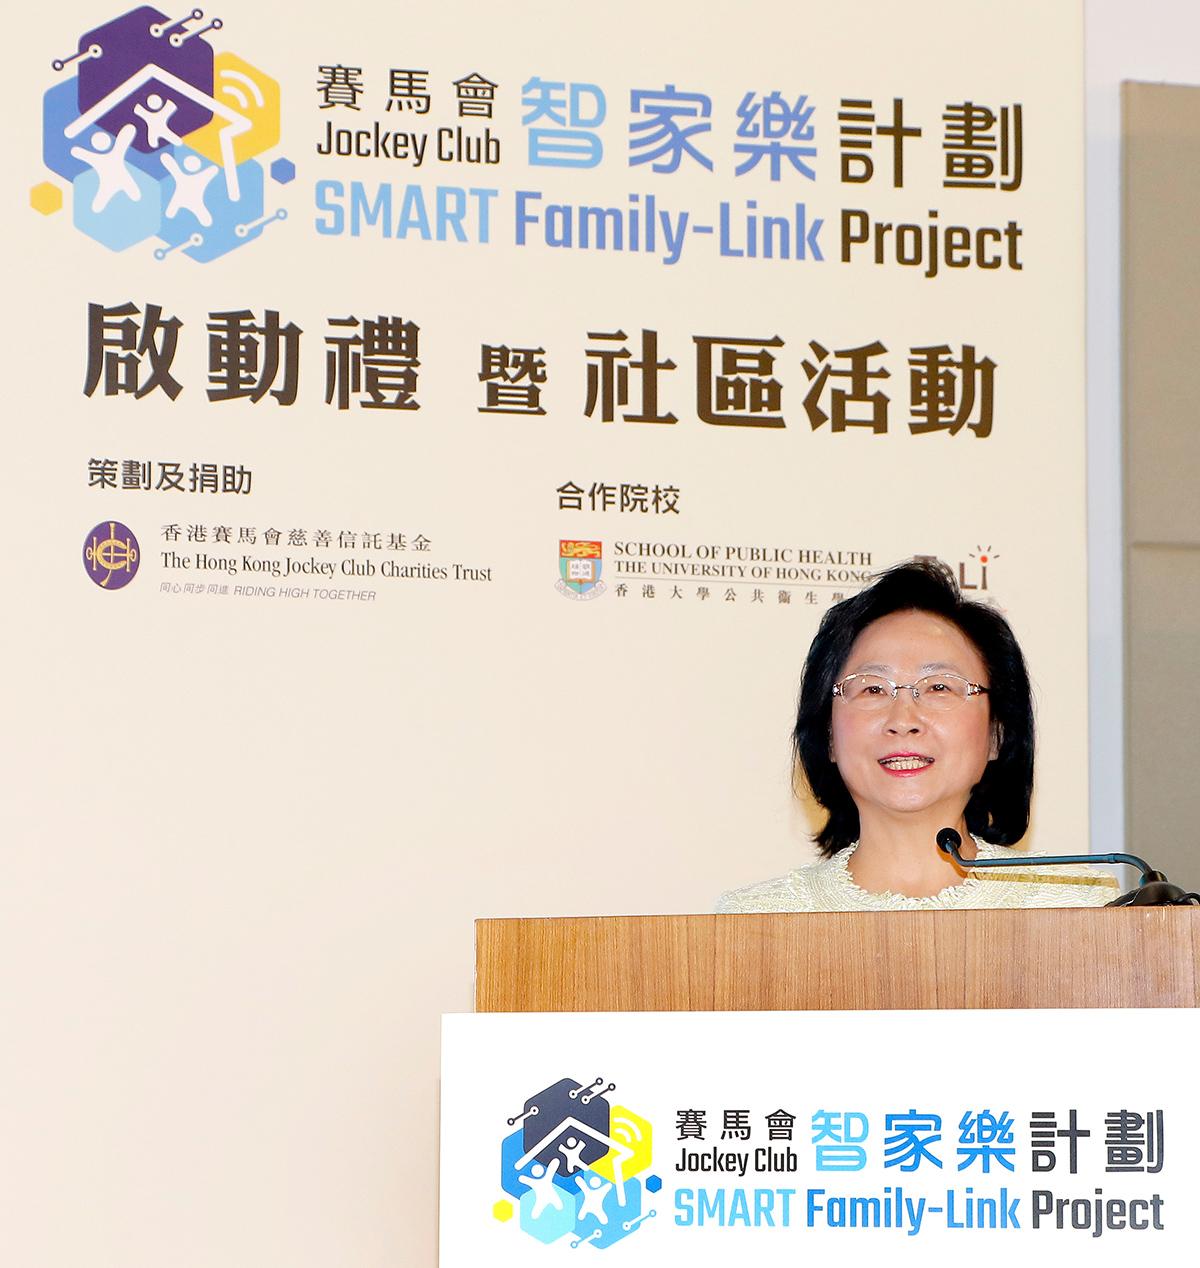 Jockey Club SMART Family-Link Project helps enhance quality of